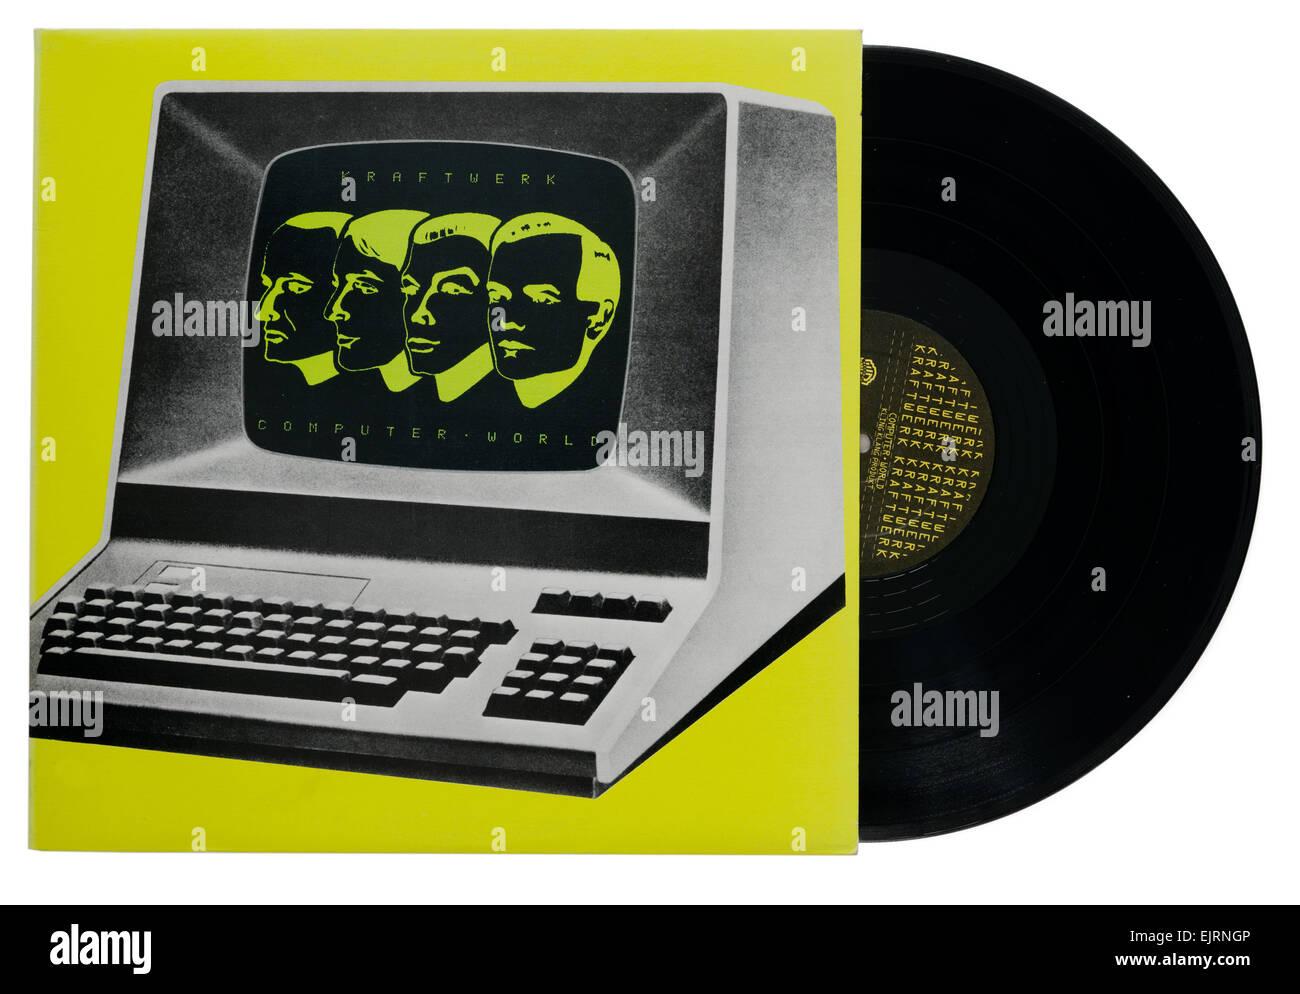 Kraftwerk Computer World album Stock Photo